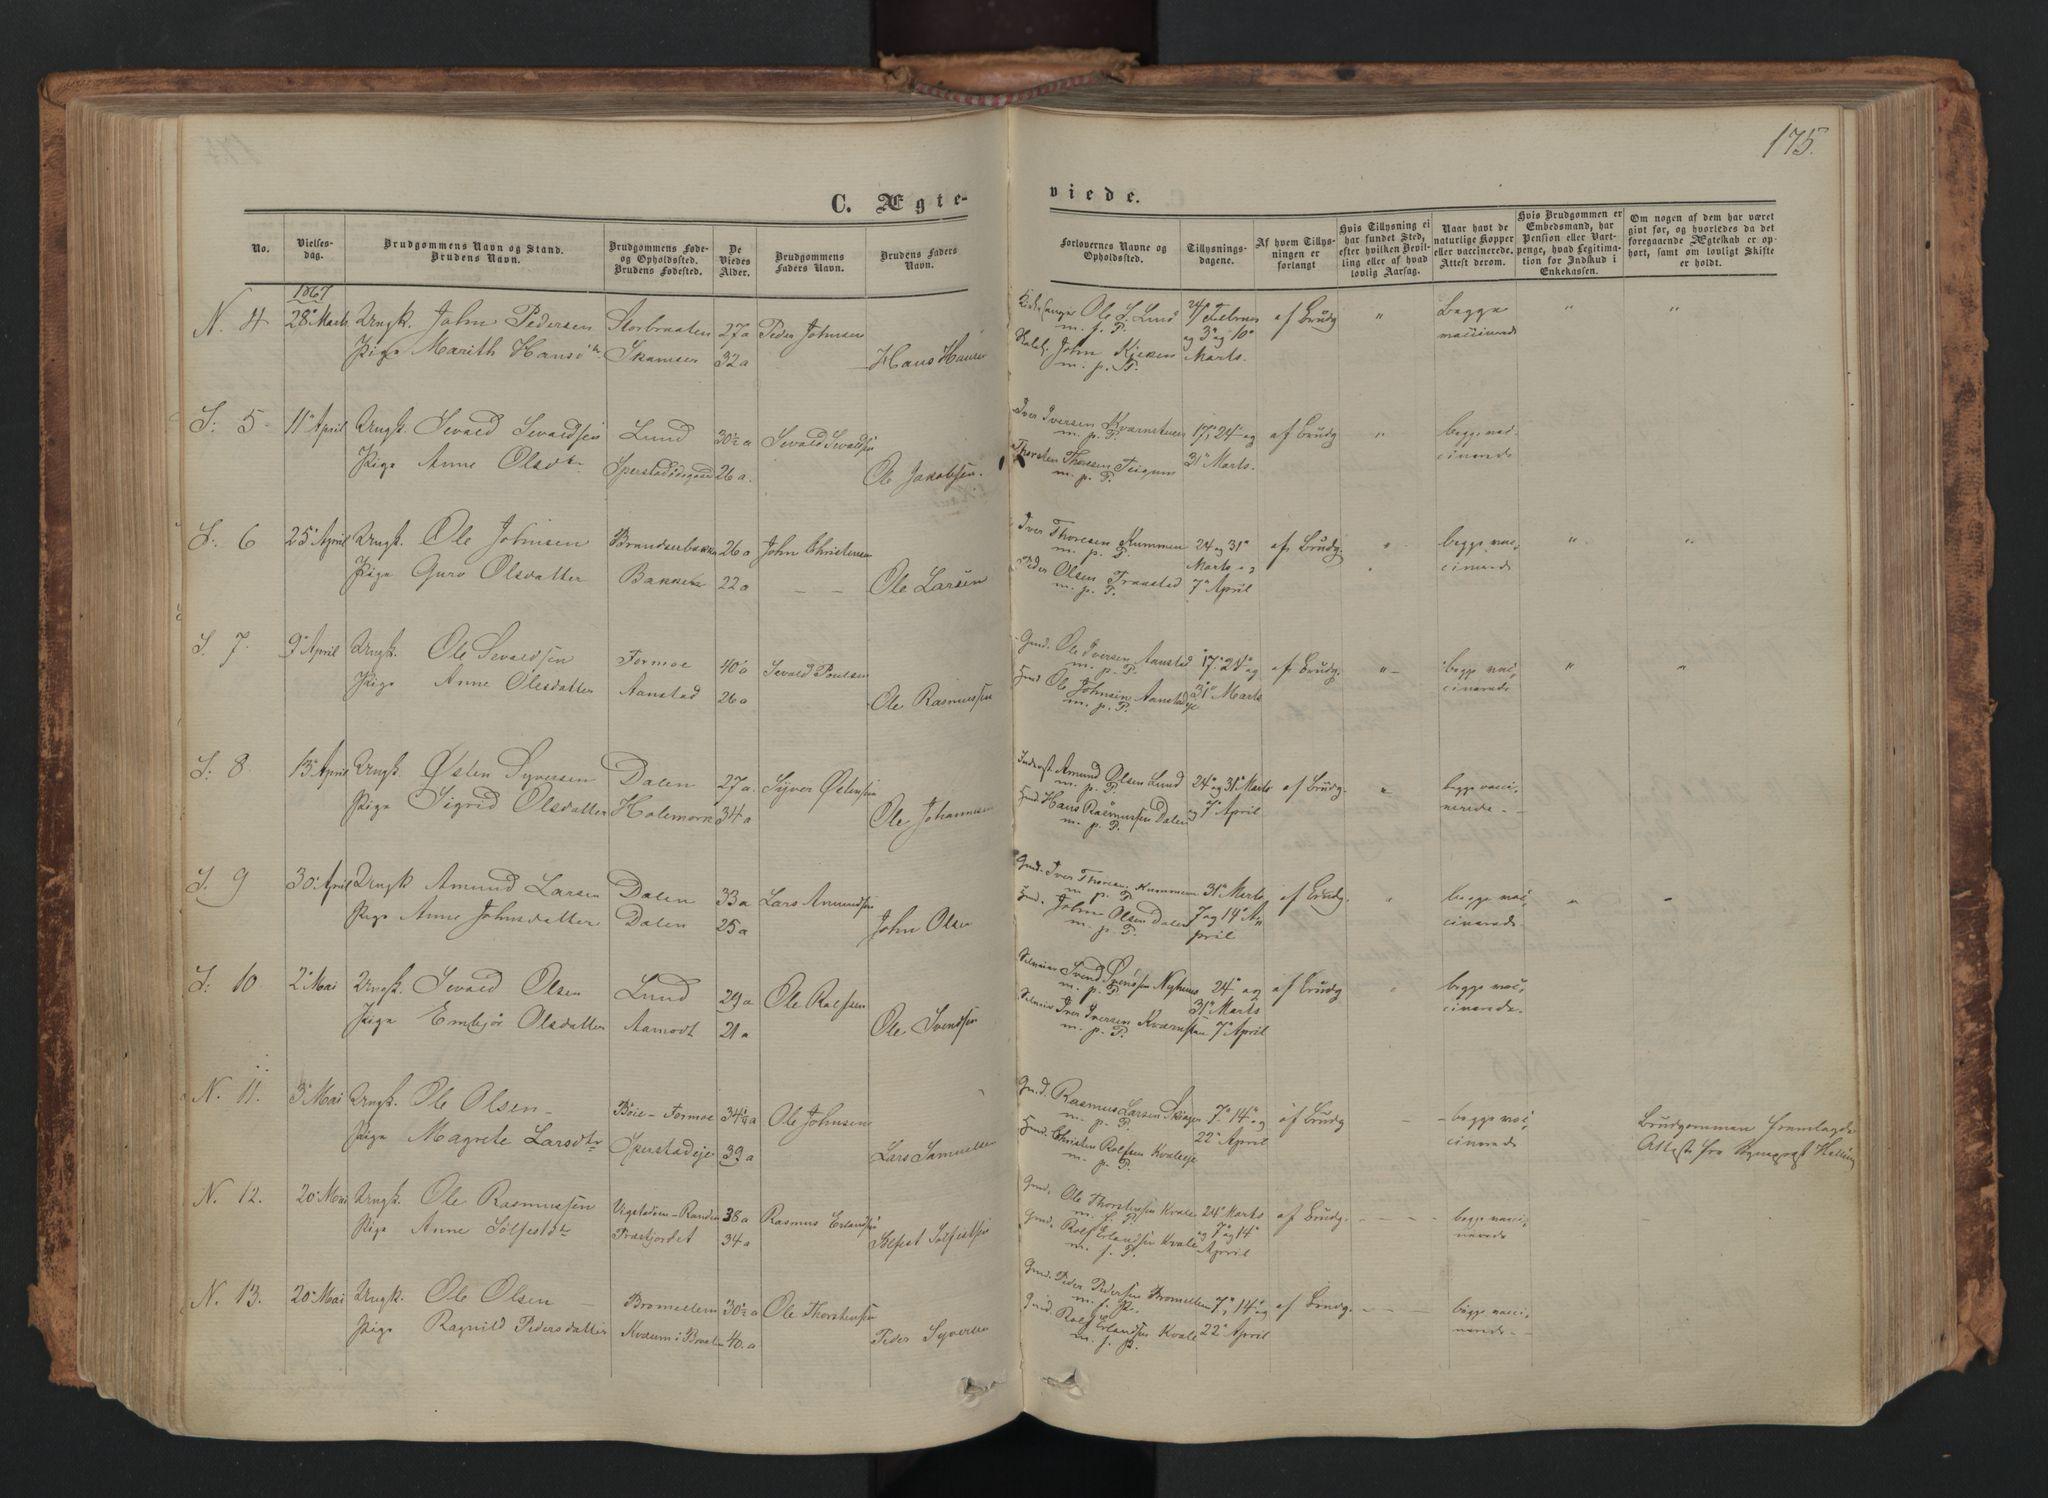 SAH, Skjåk prestekontor, Ministerialbok nr. 1, 1863-1879, s. 175